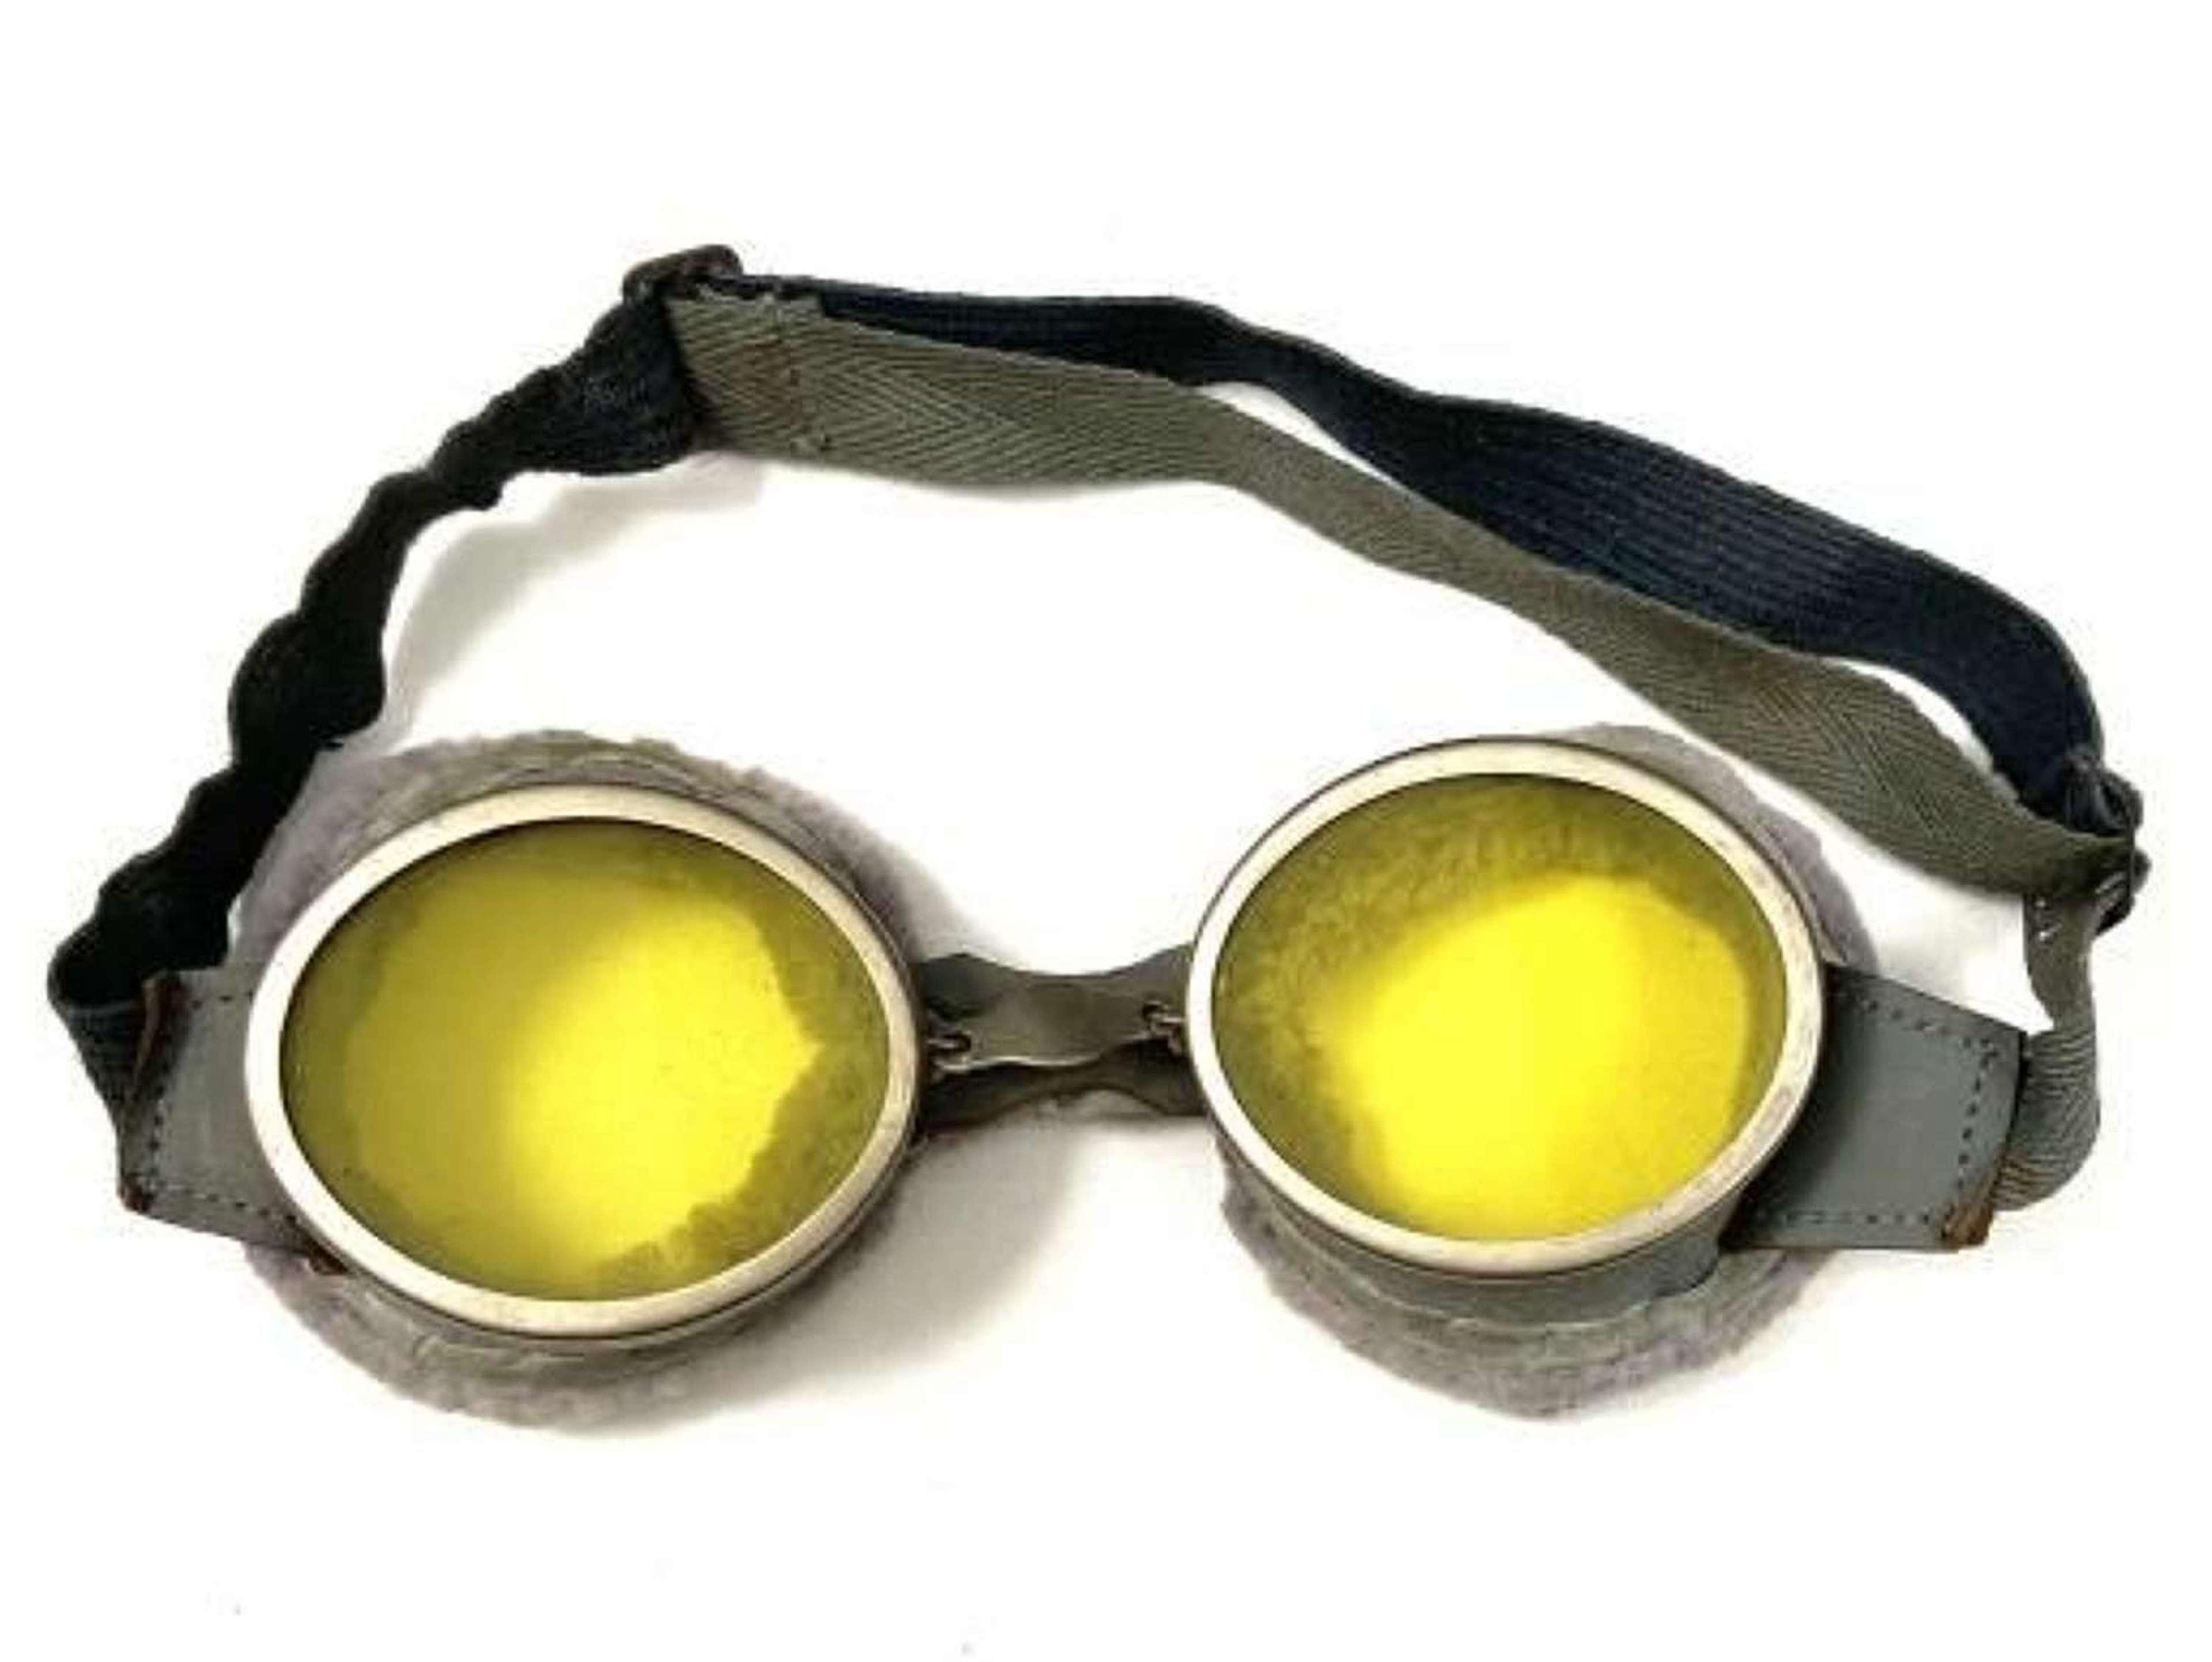 Original 1940 Dated British Army MT Goggles + Case